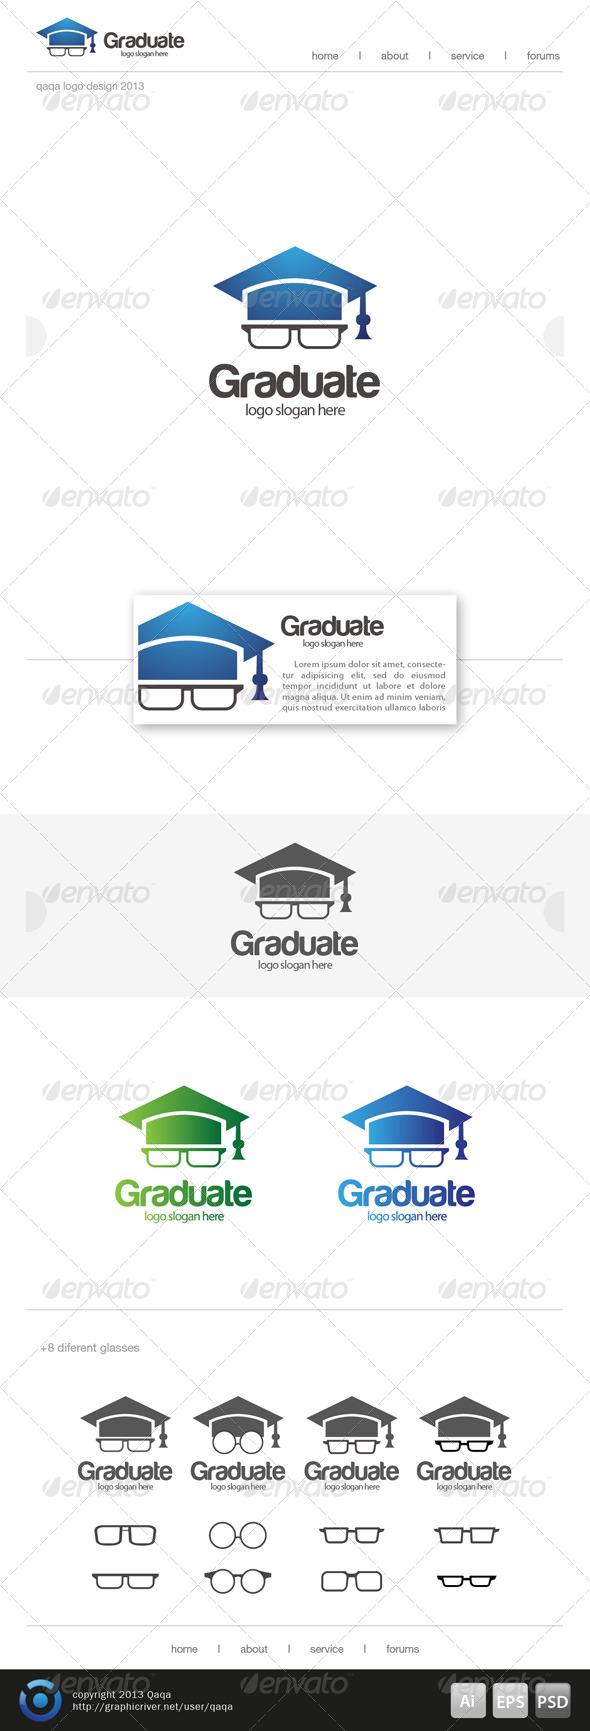 Geeks Graduate Logo - Logo Templates